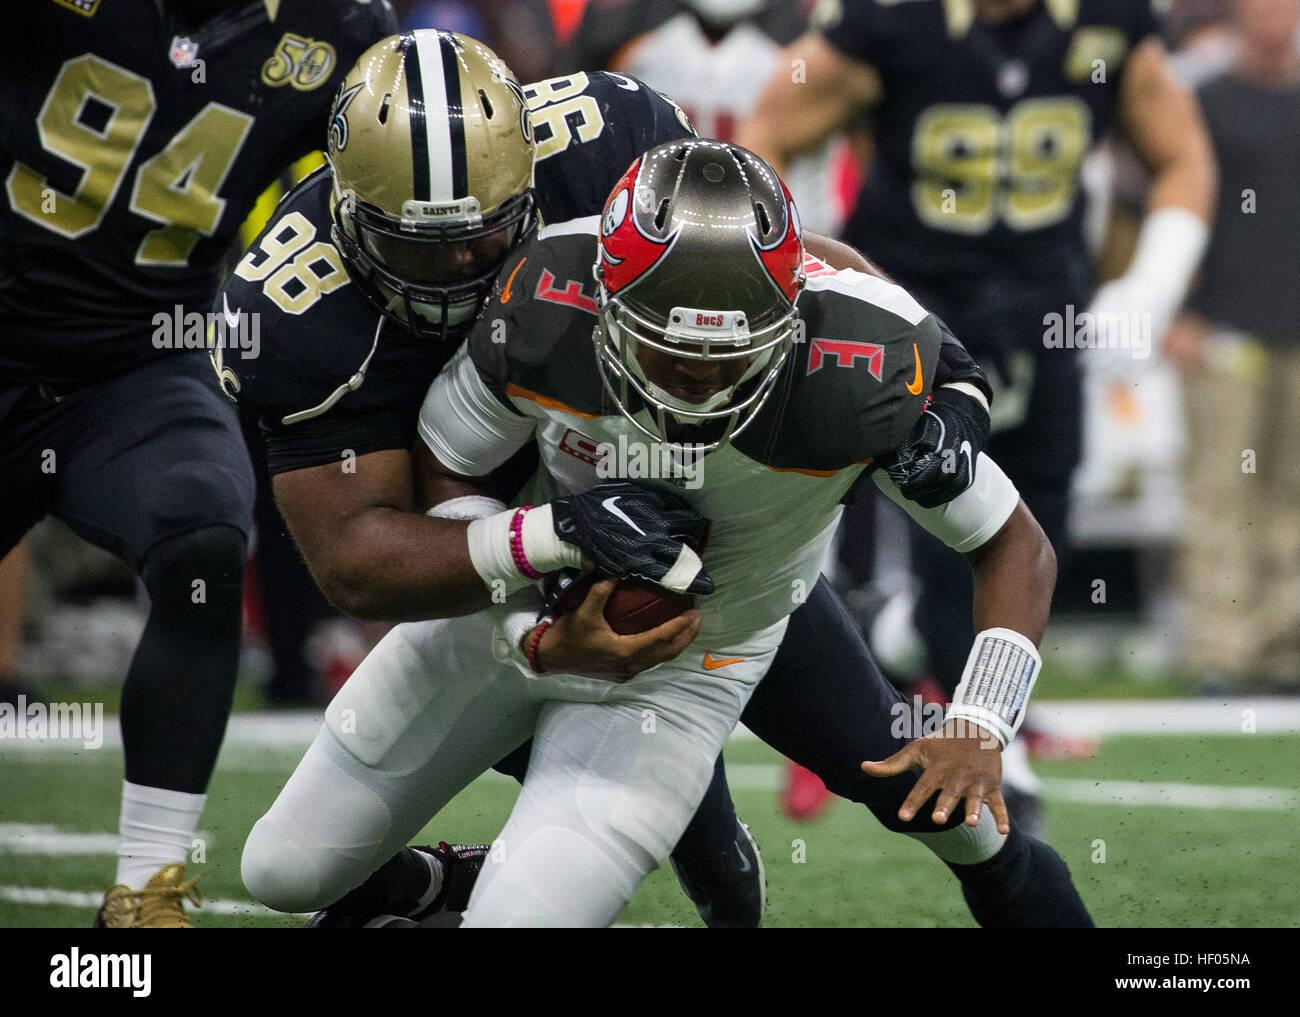 Florida, USA. 24th Dec, 2016. LOREN ELLIOTT   Times .Tampa Bay Buccaneers quarterback Jameis Winston (3) is sacked - Stock Image